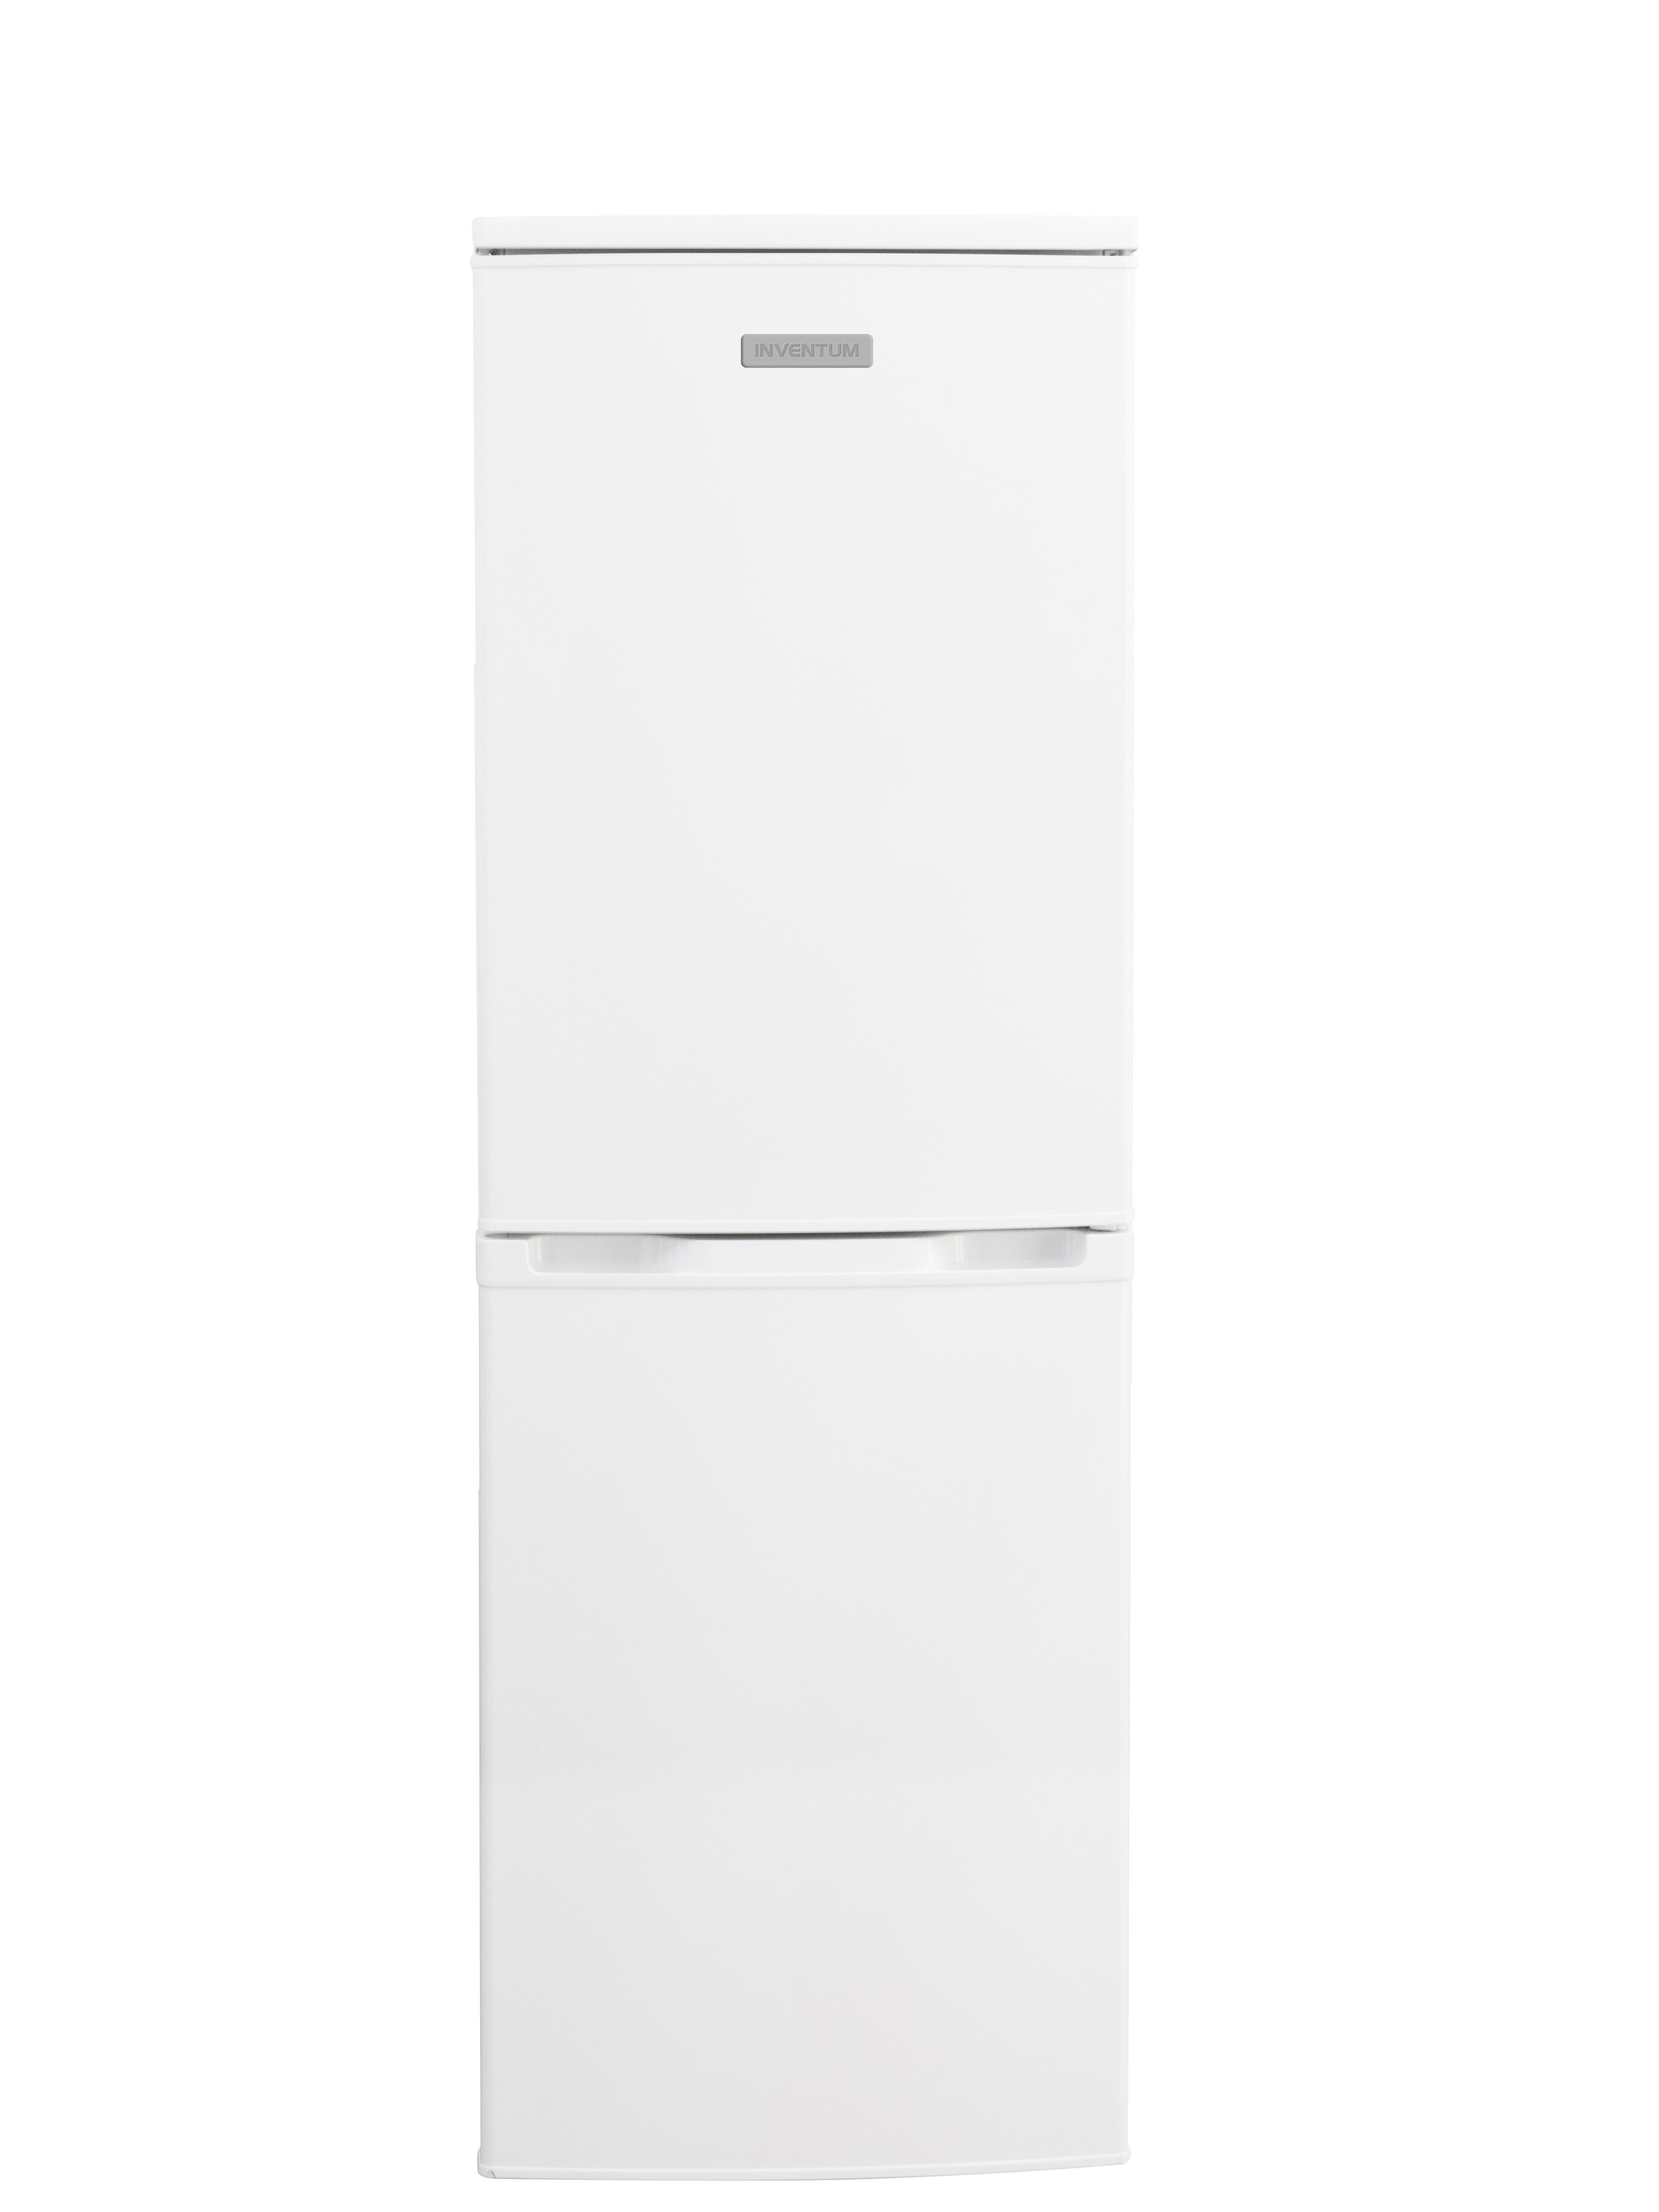 Inventum koelkast met vriesvak KV1530 wit